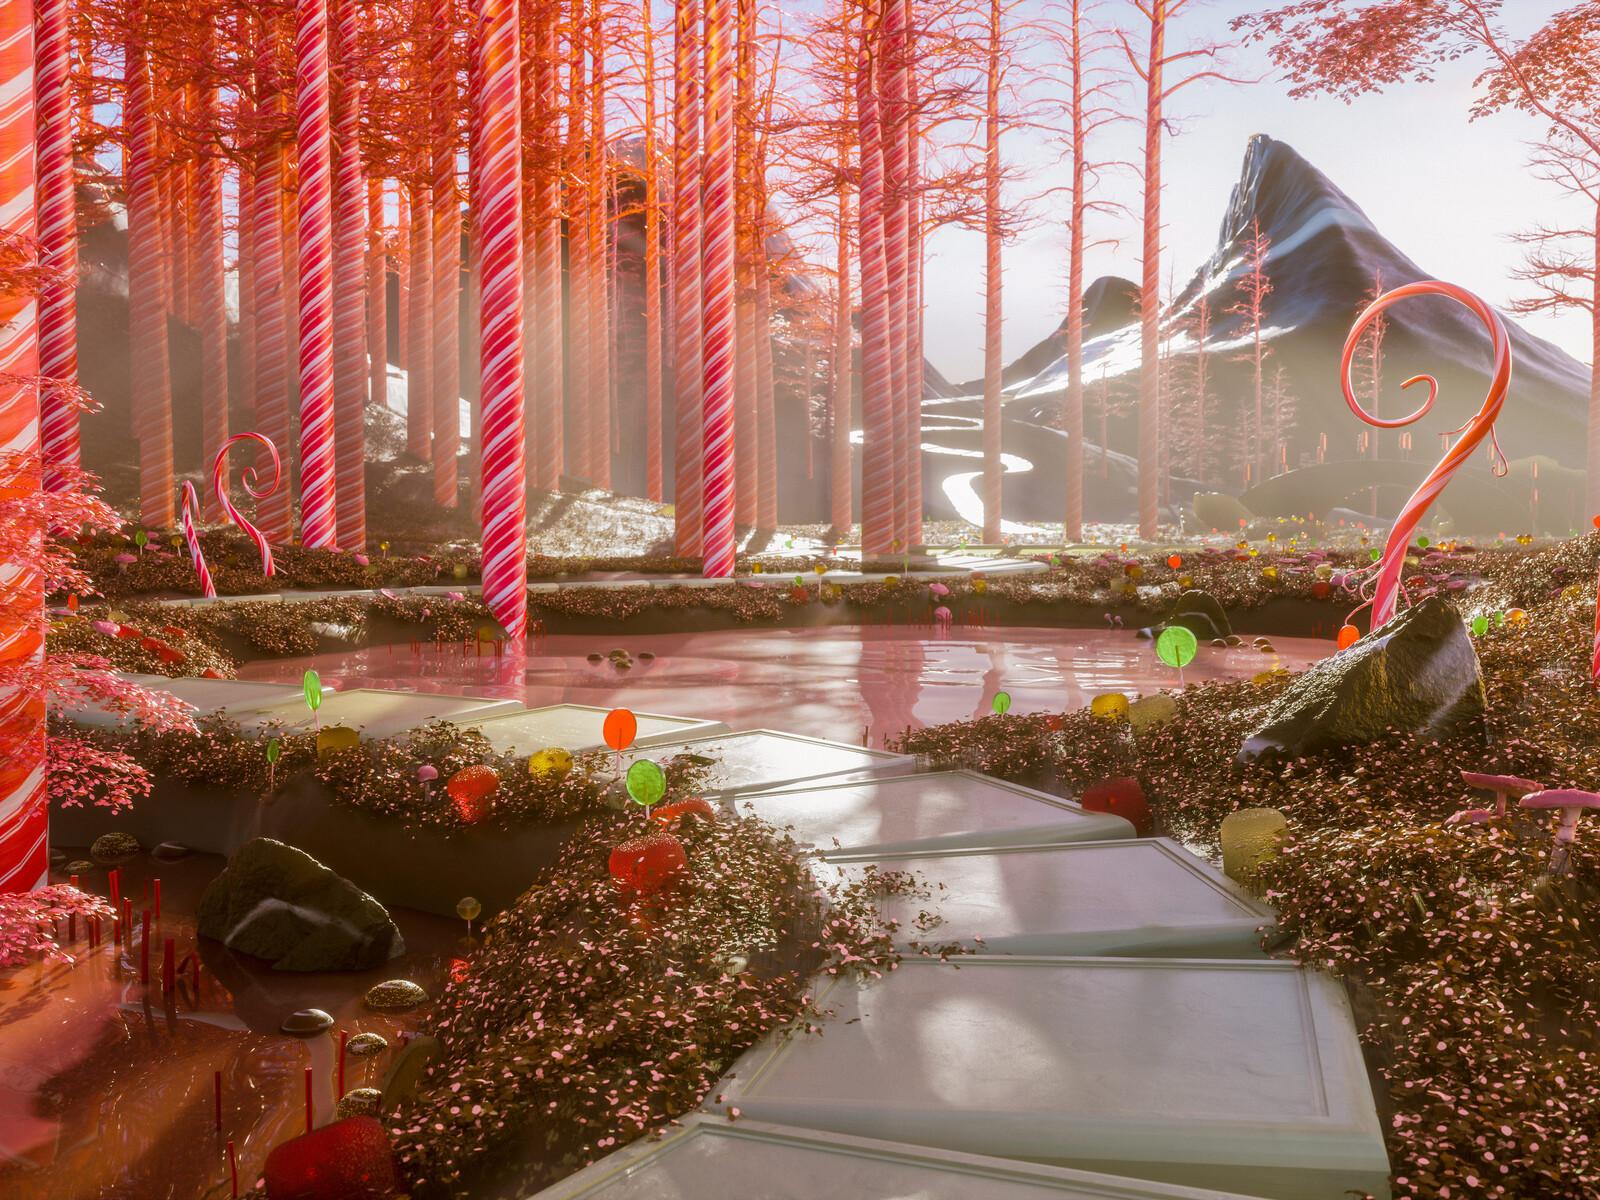 candy-cane-forest-4k-lt.jpg